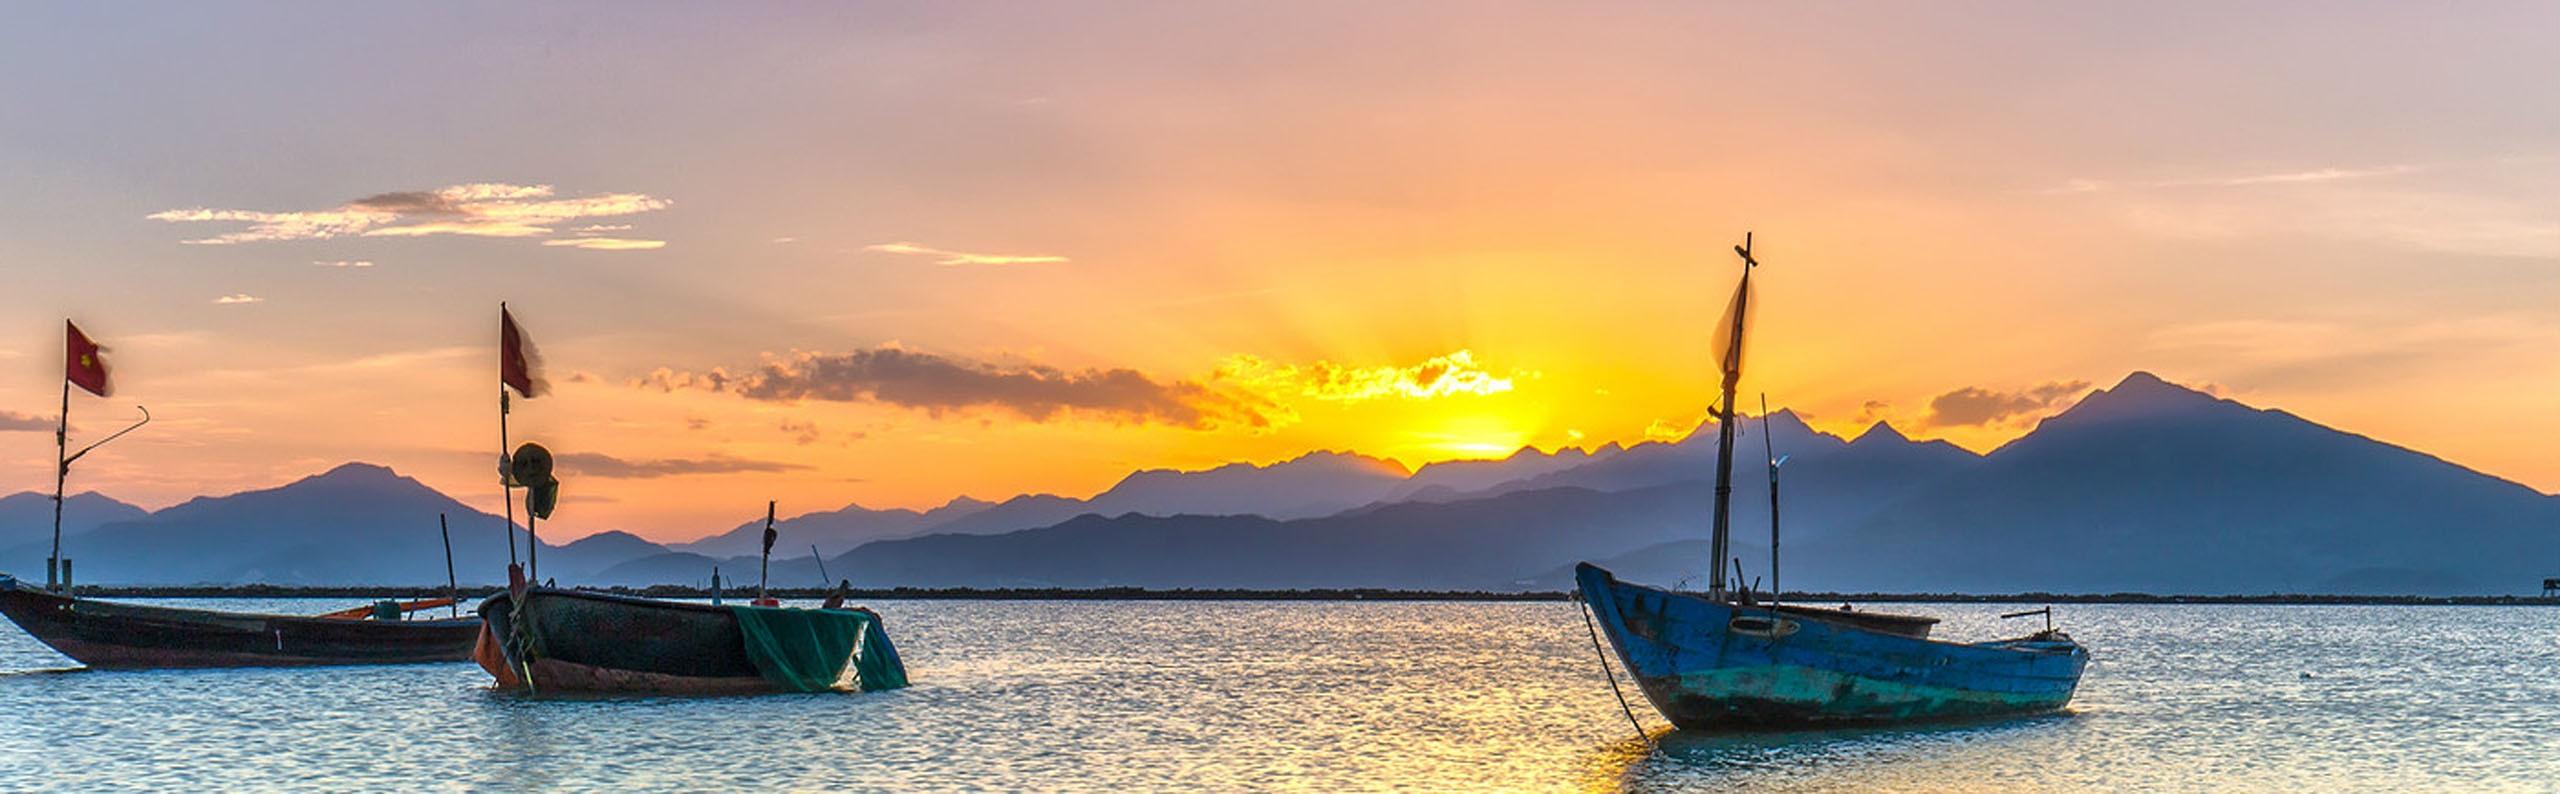 Top 8 Things to Do in Danang